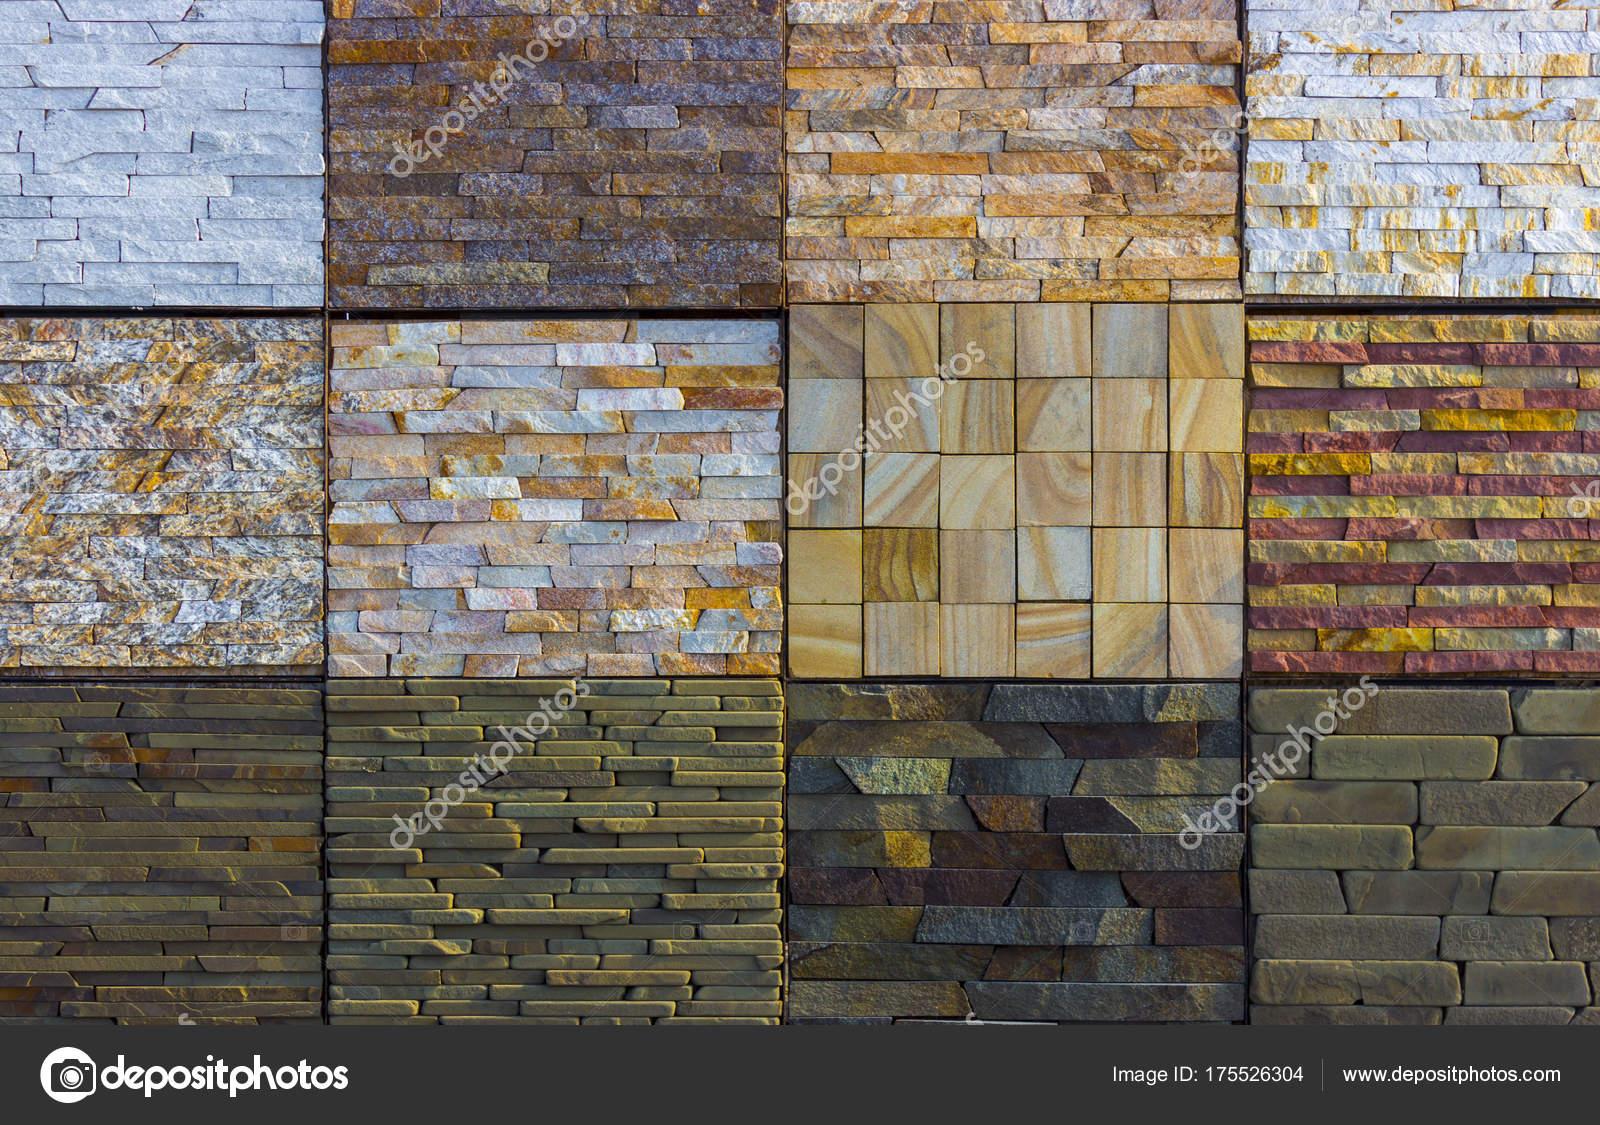 Varie piastrelle decorative e campioni di pietra naturali u foto